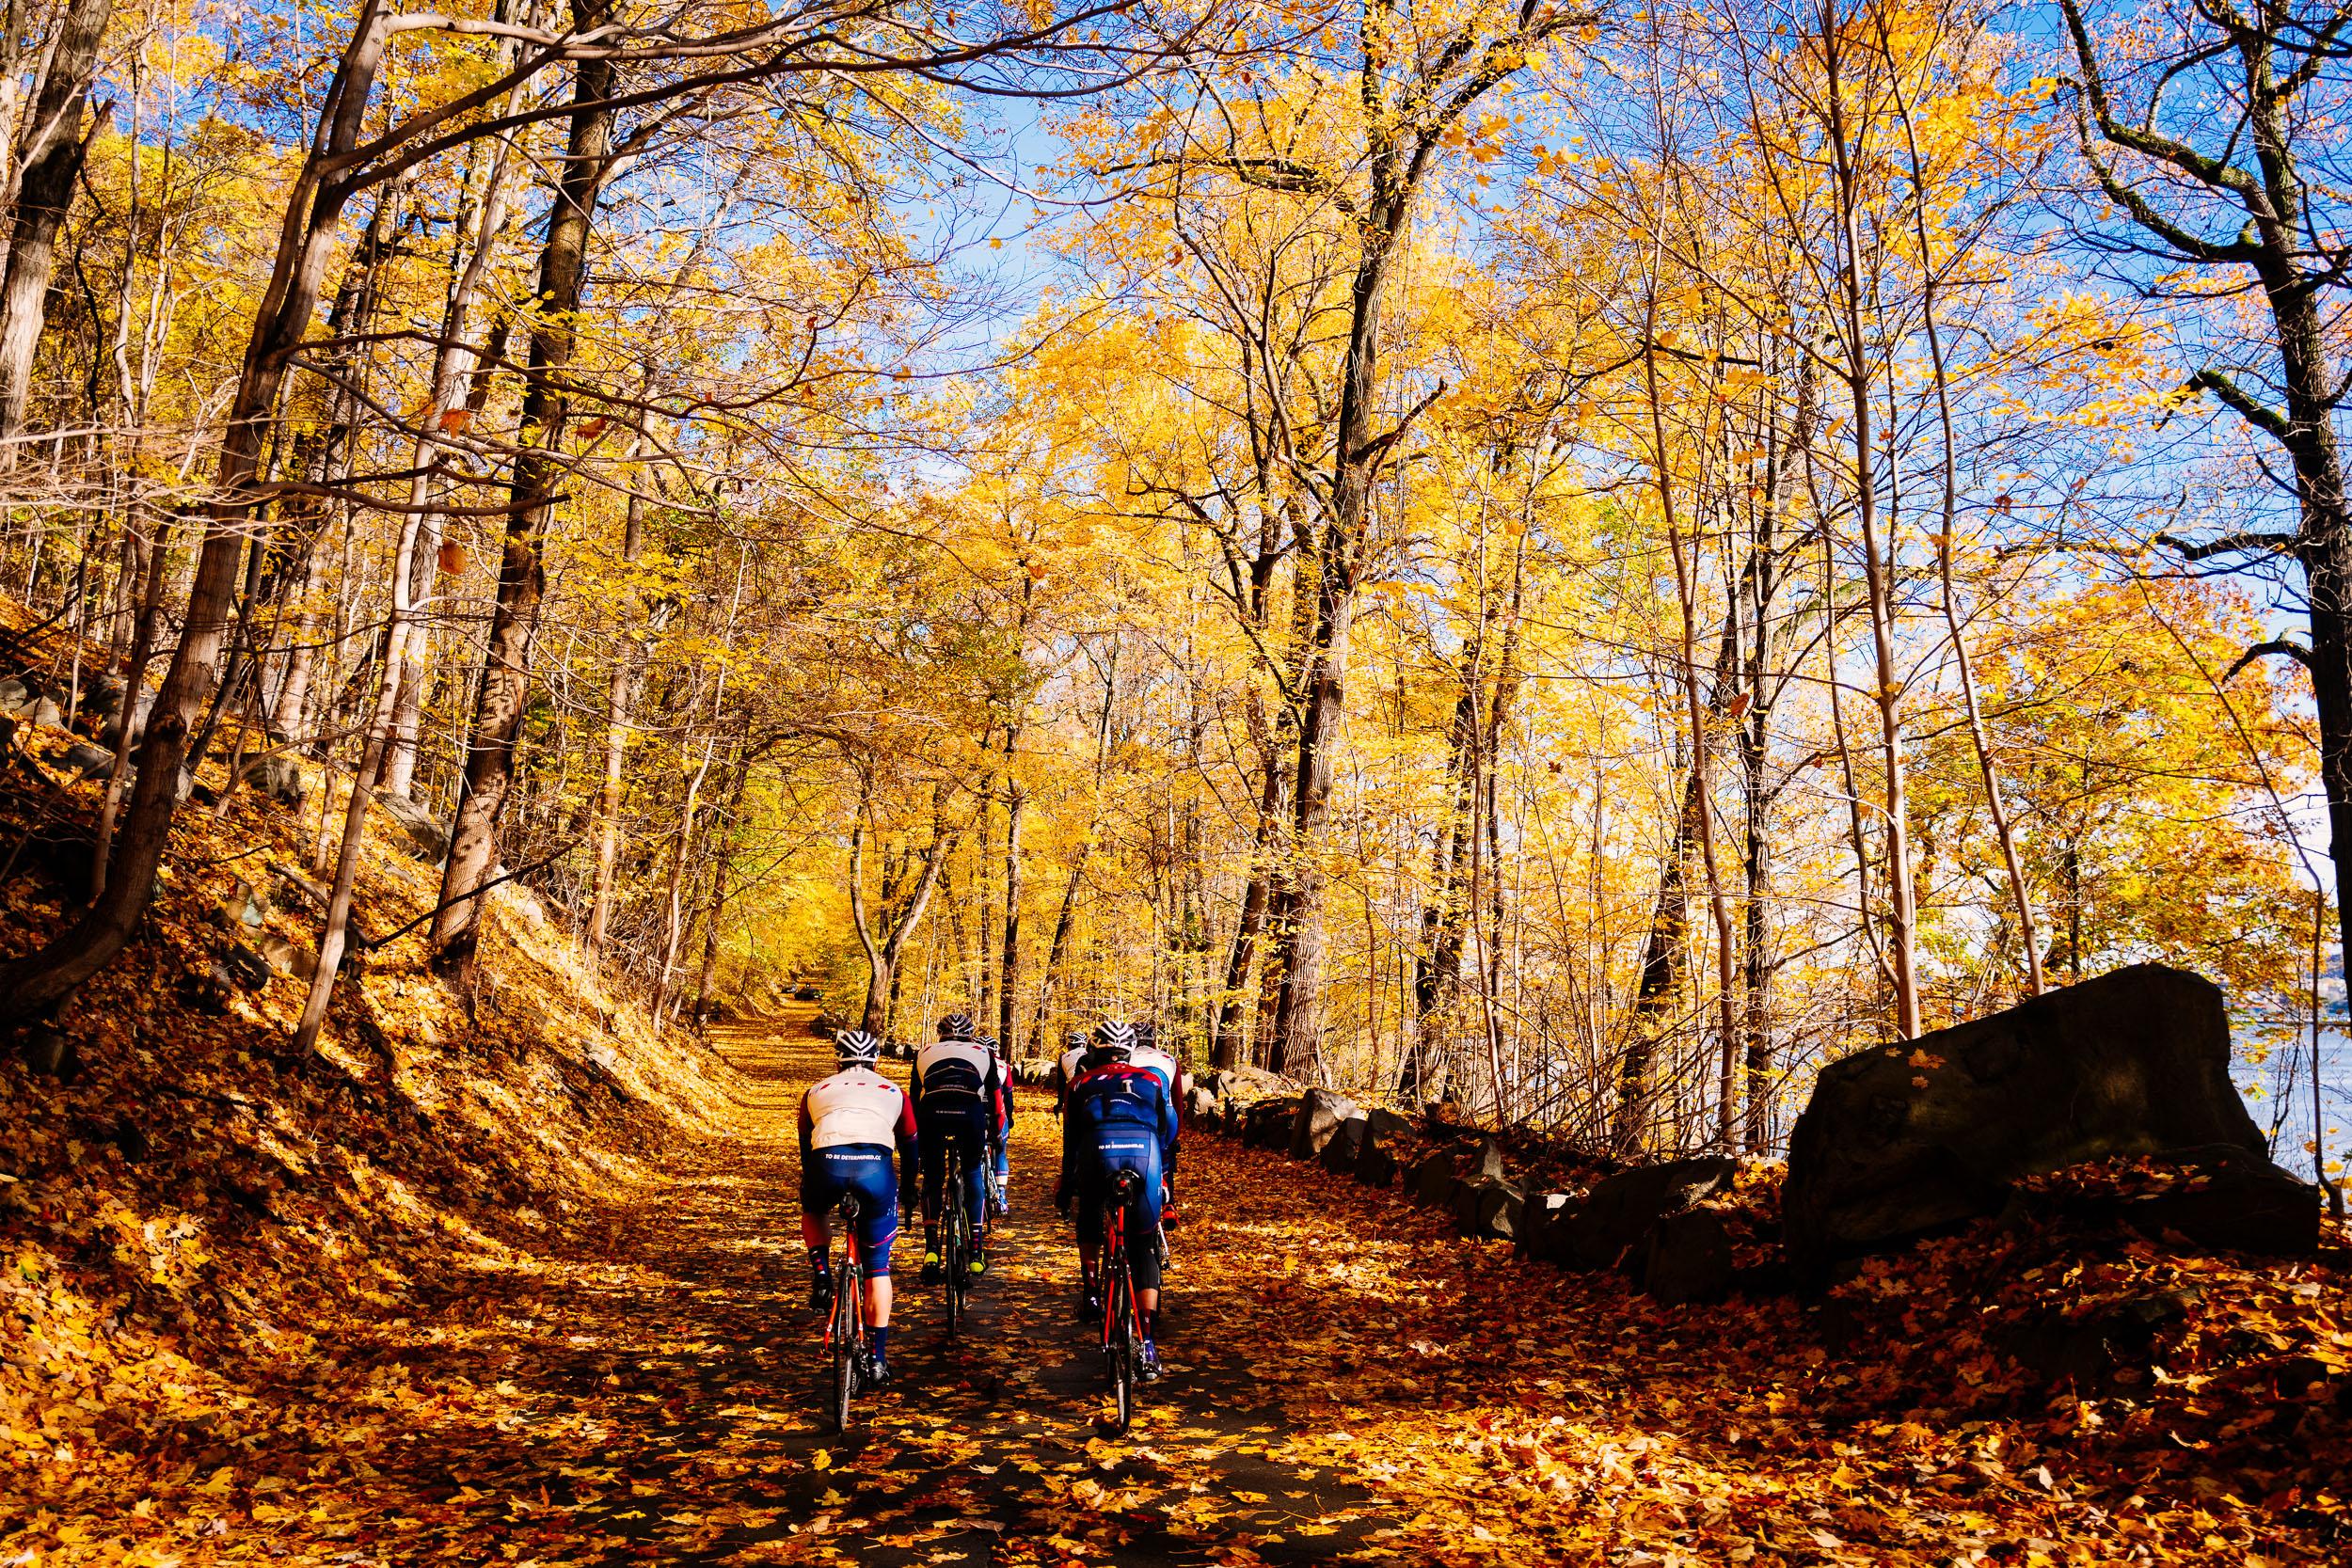 photo-rhetoric-to-be-determined-river-road-fall-foliage-5036.jpg